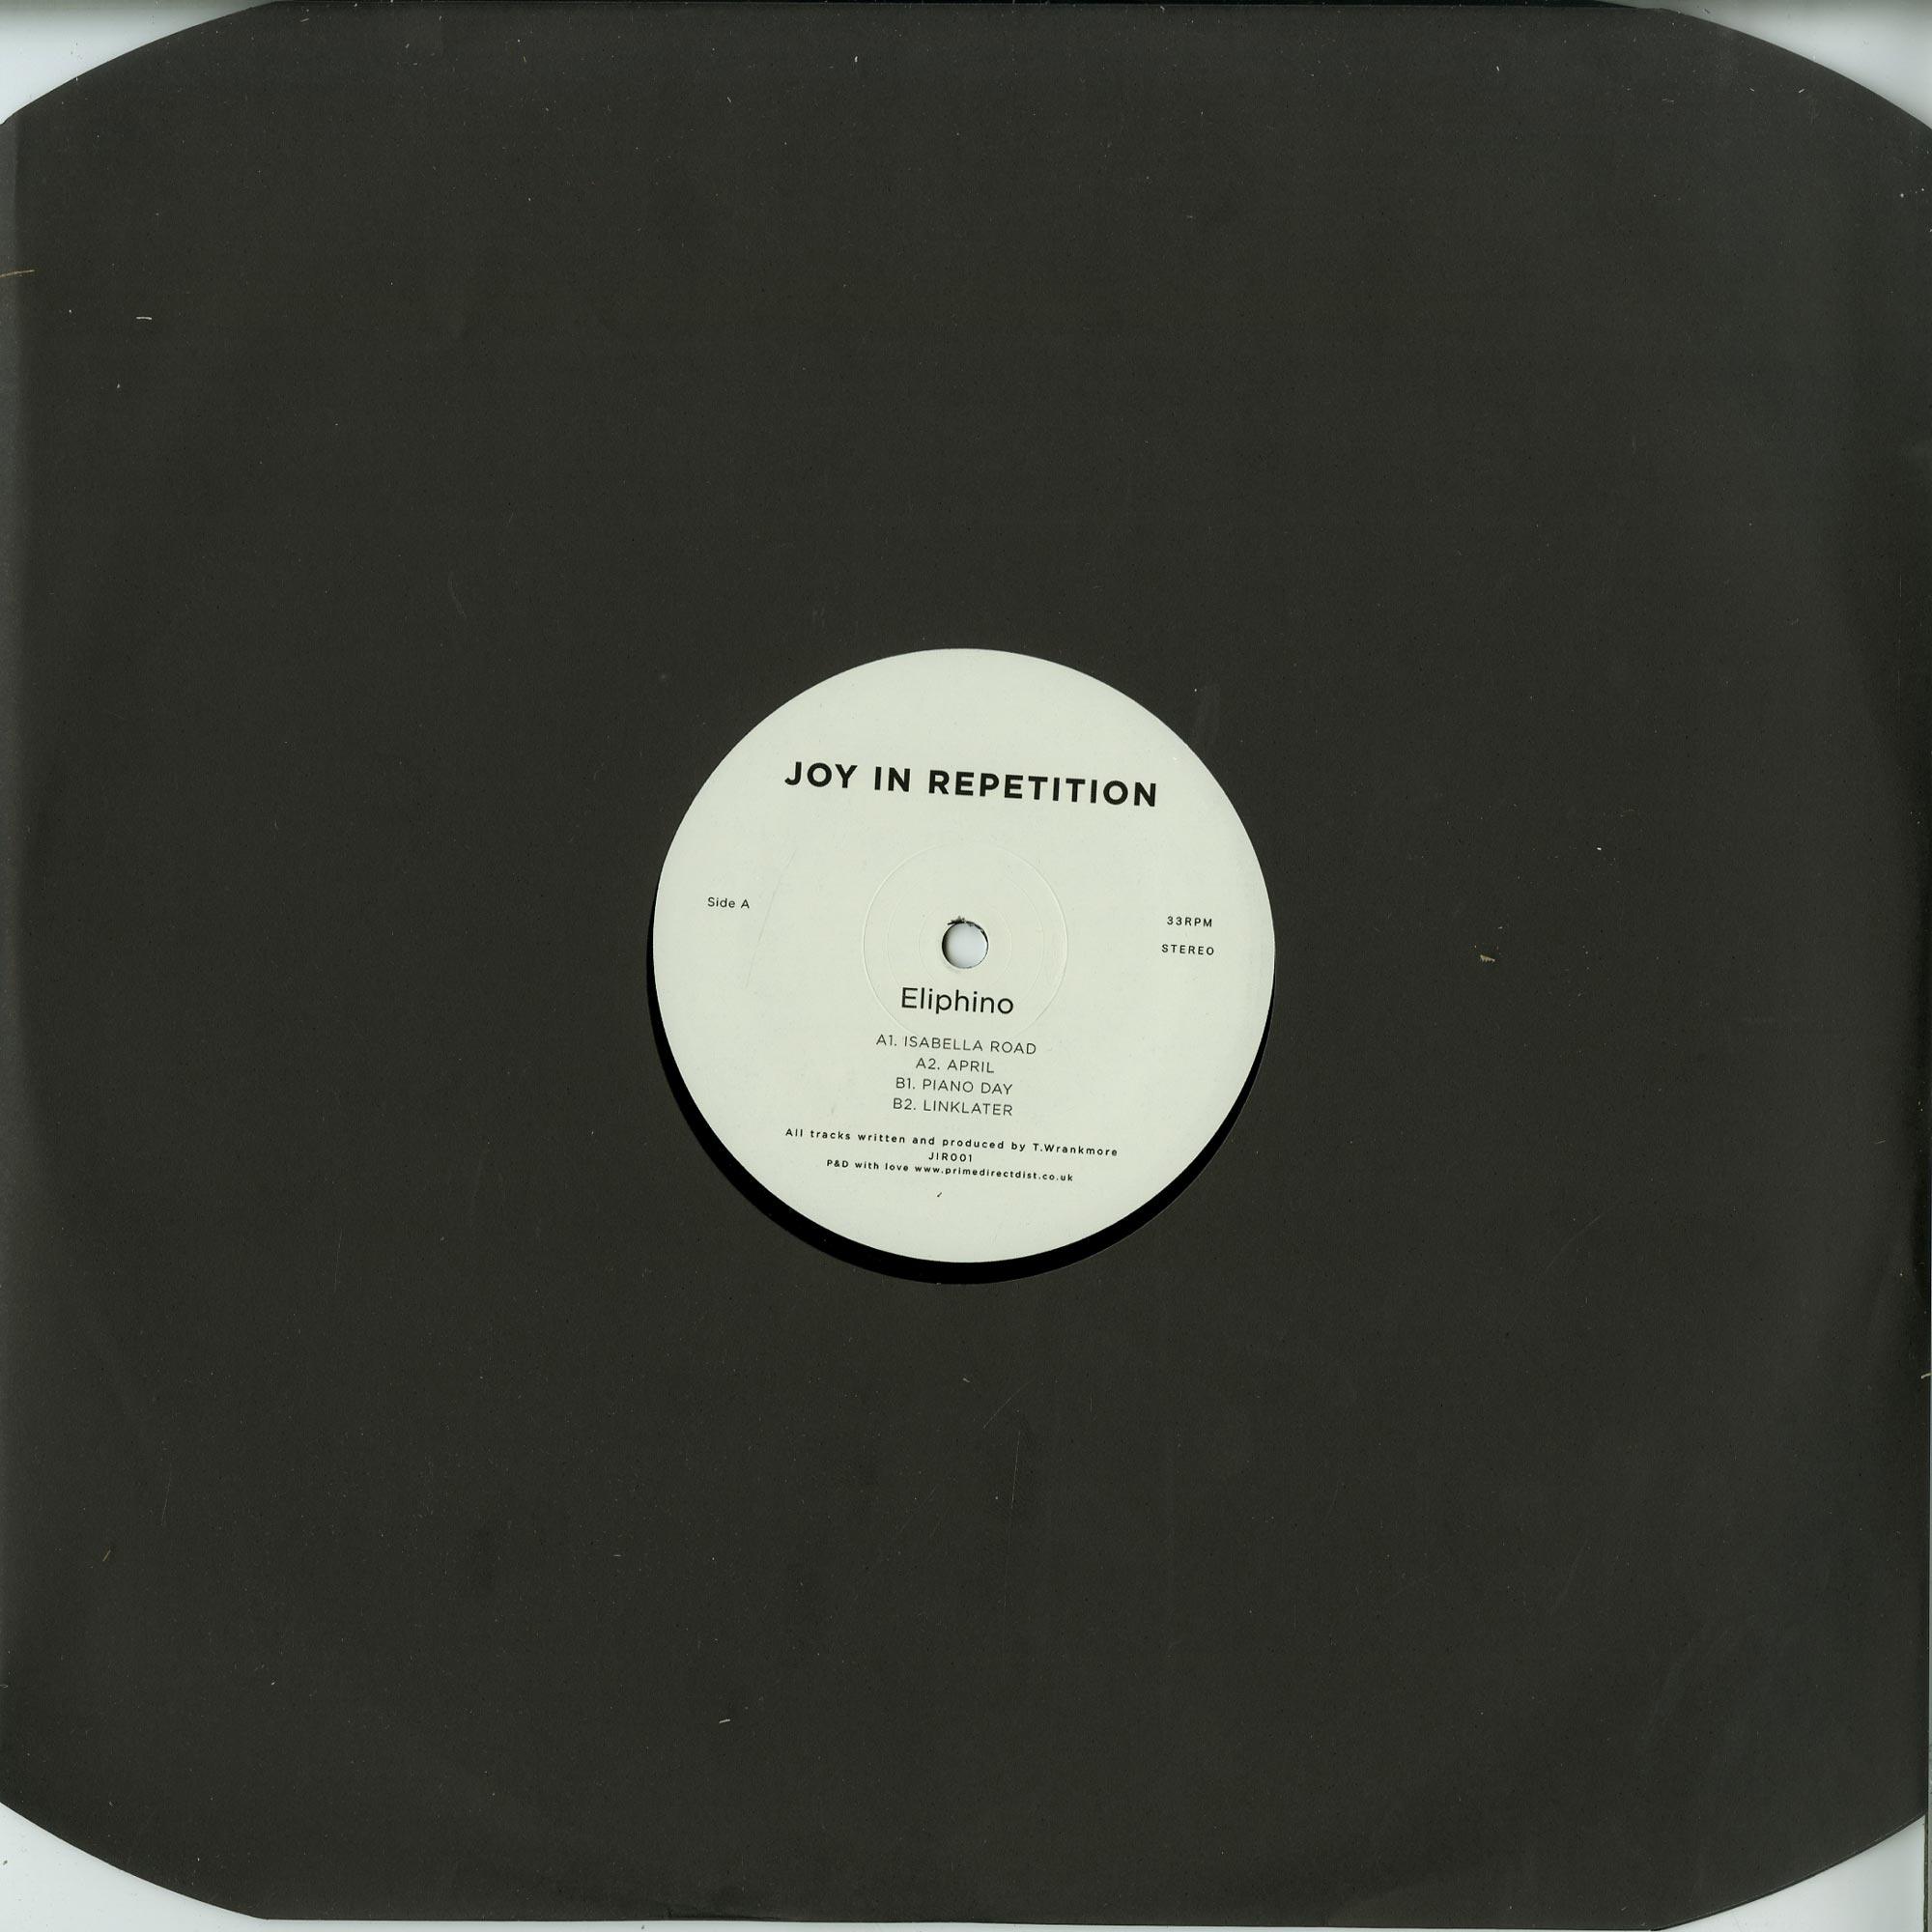 Eliphino - JOY IN REPETITION EP 1